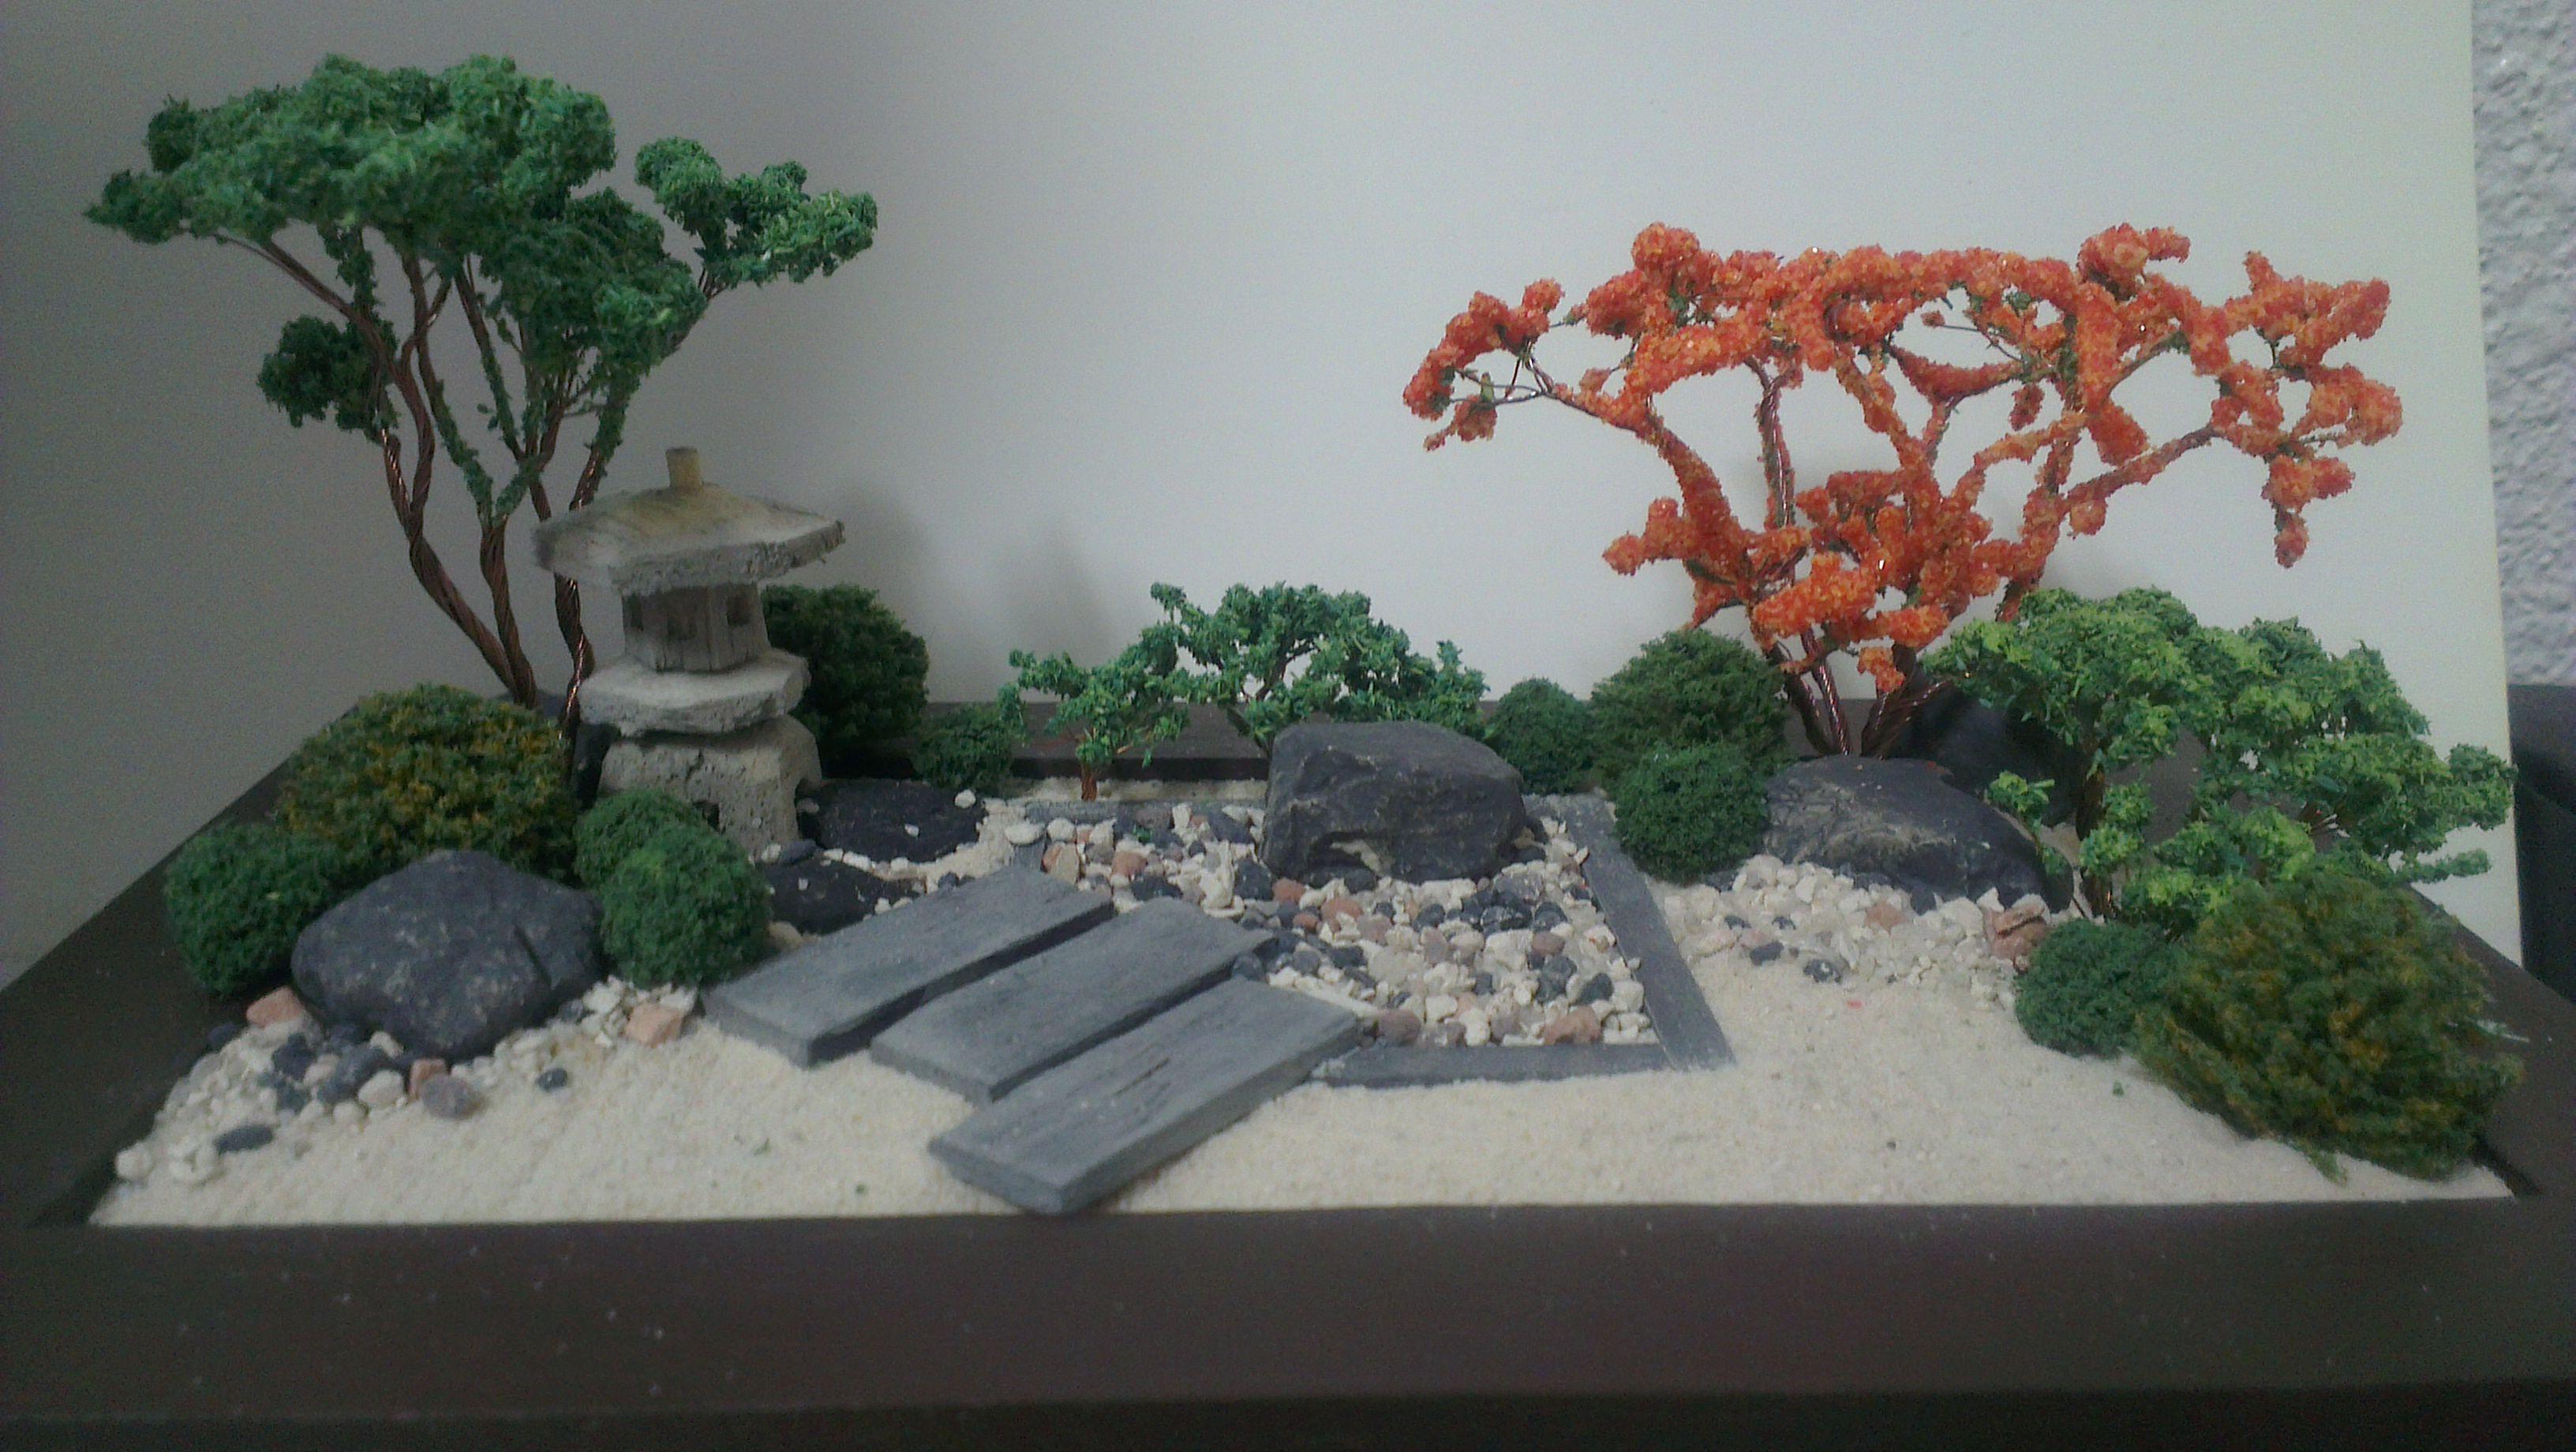 wallzart miniature zen garden miniature zen garden. Black Bedroom Furniture Sets. Home Design Ideas